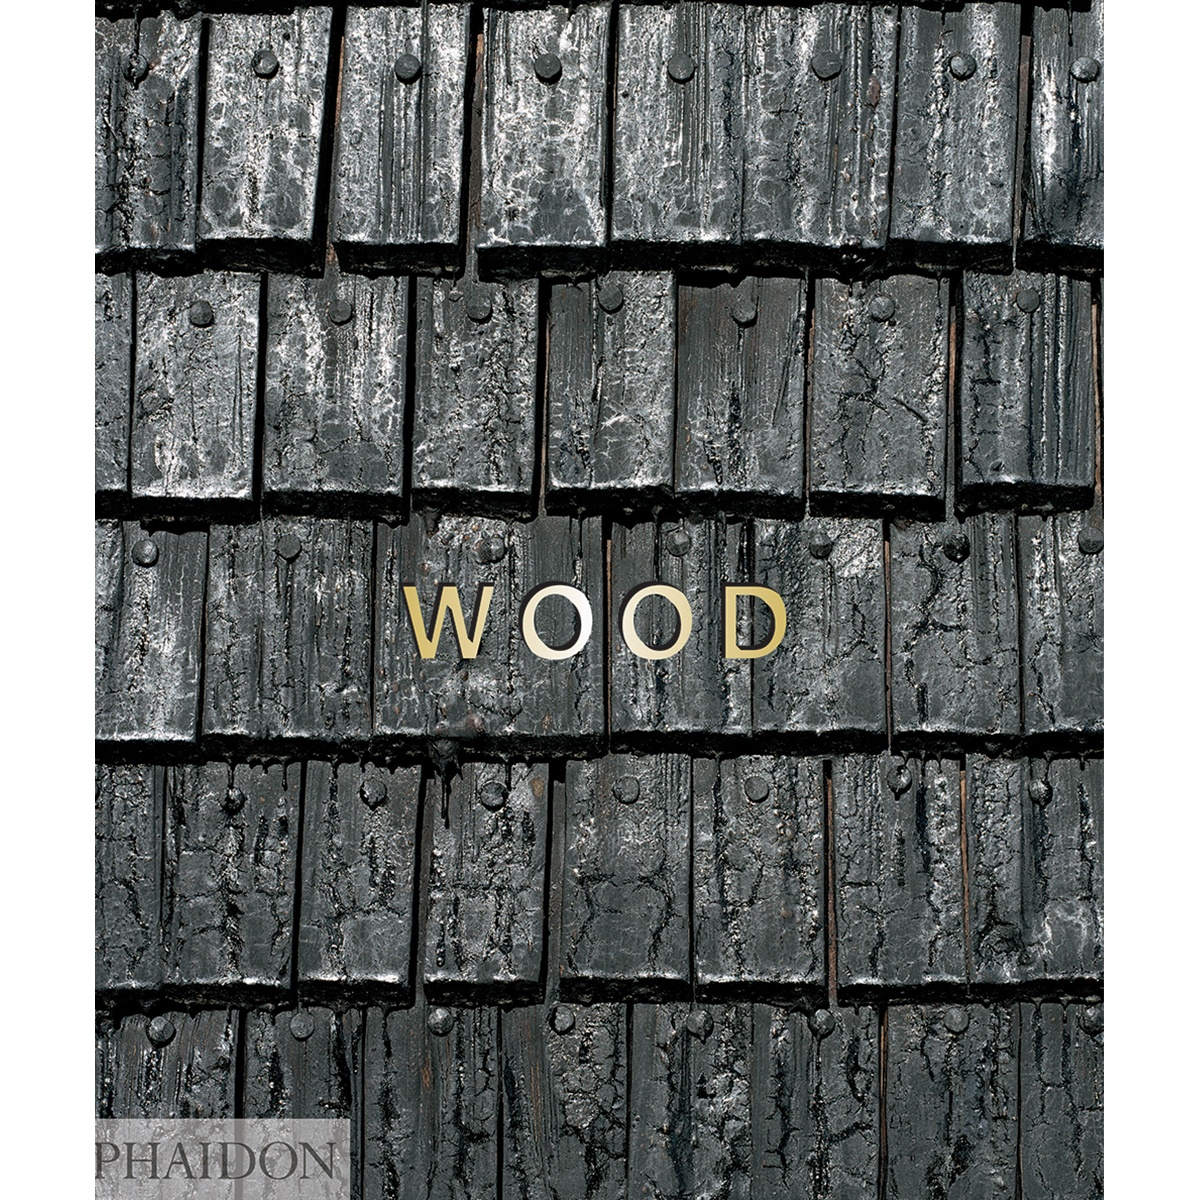 Book, wood, Phaidon